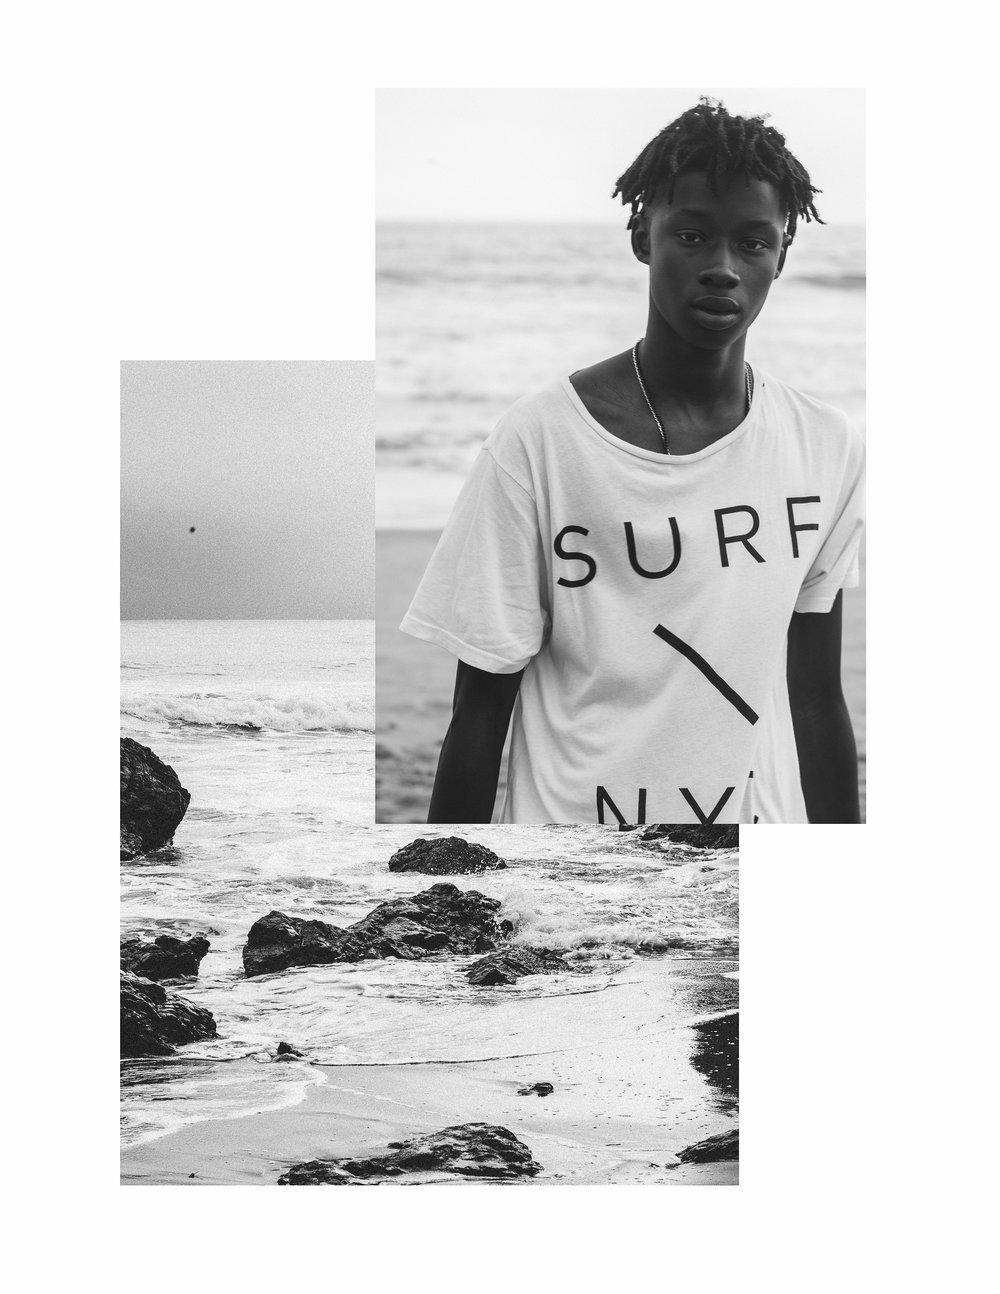 MM SURF-8.jpg